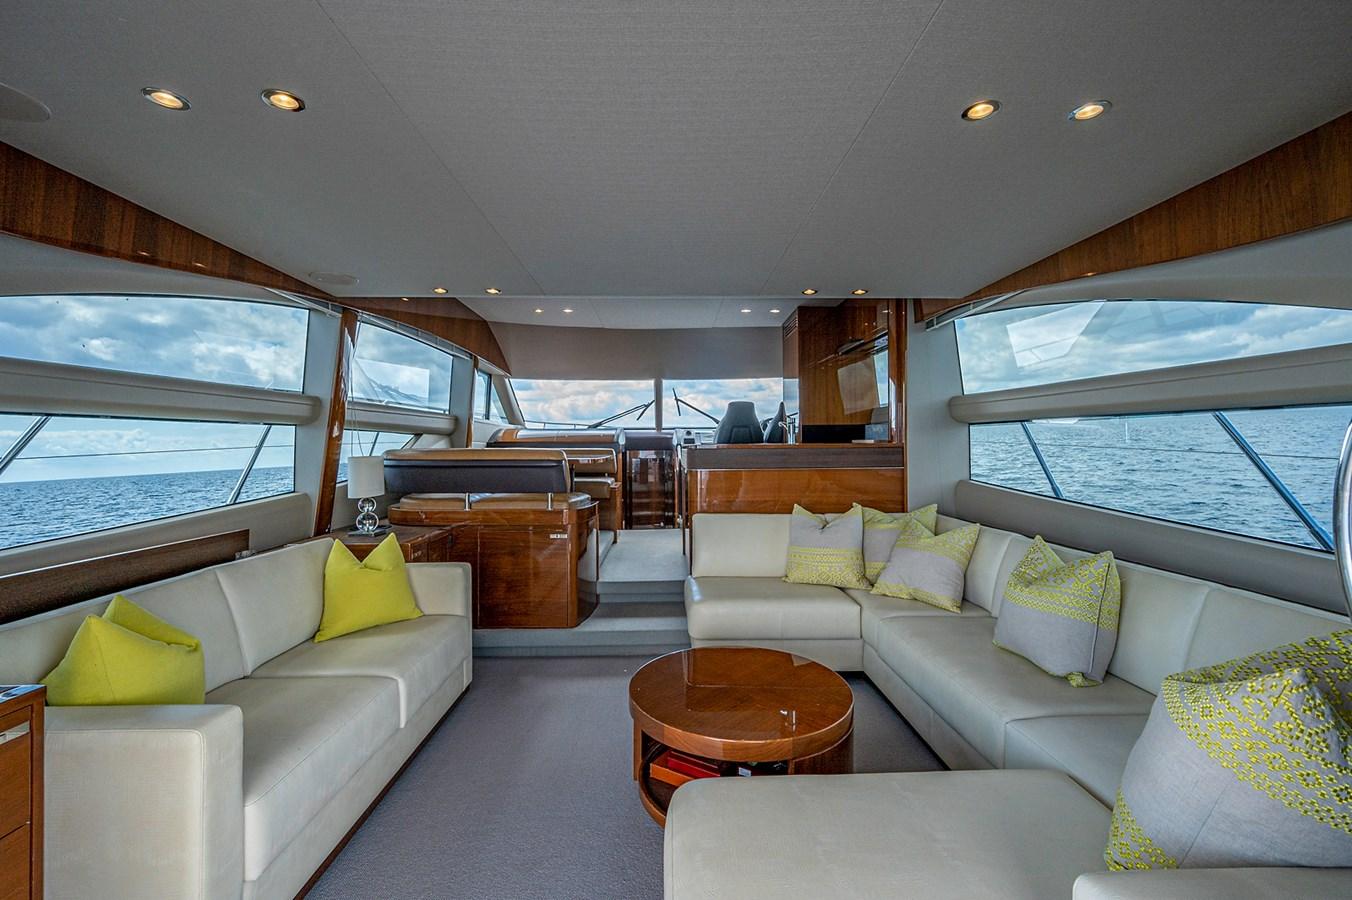 Bow To Stern_Salon1 2015 PRINCESS YACHTS 56 Motor Yacht 2932846